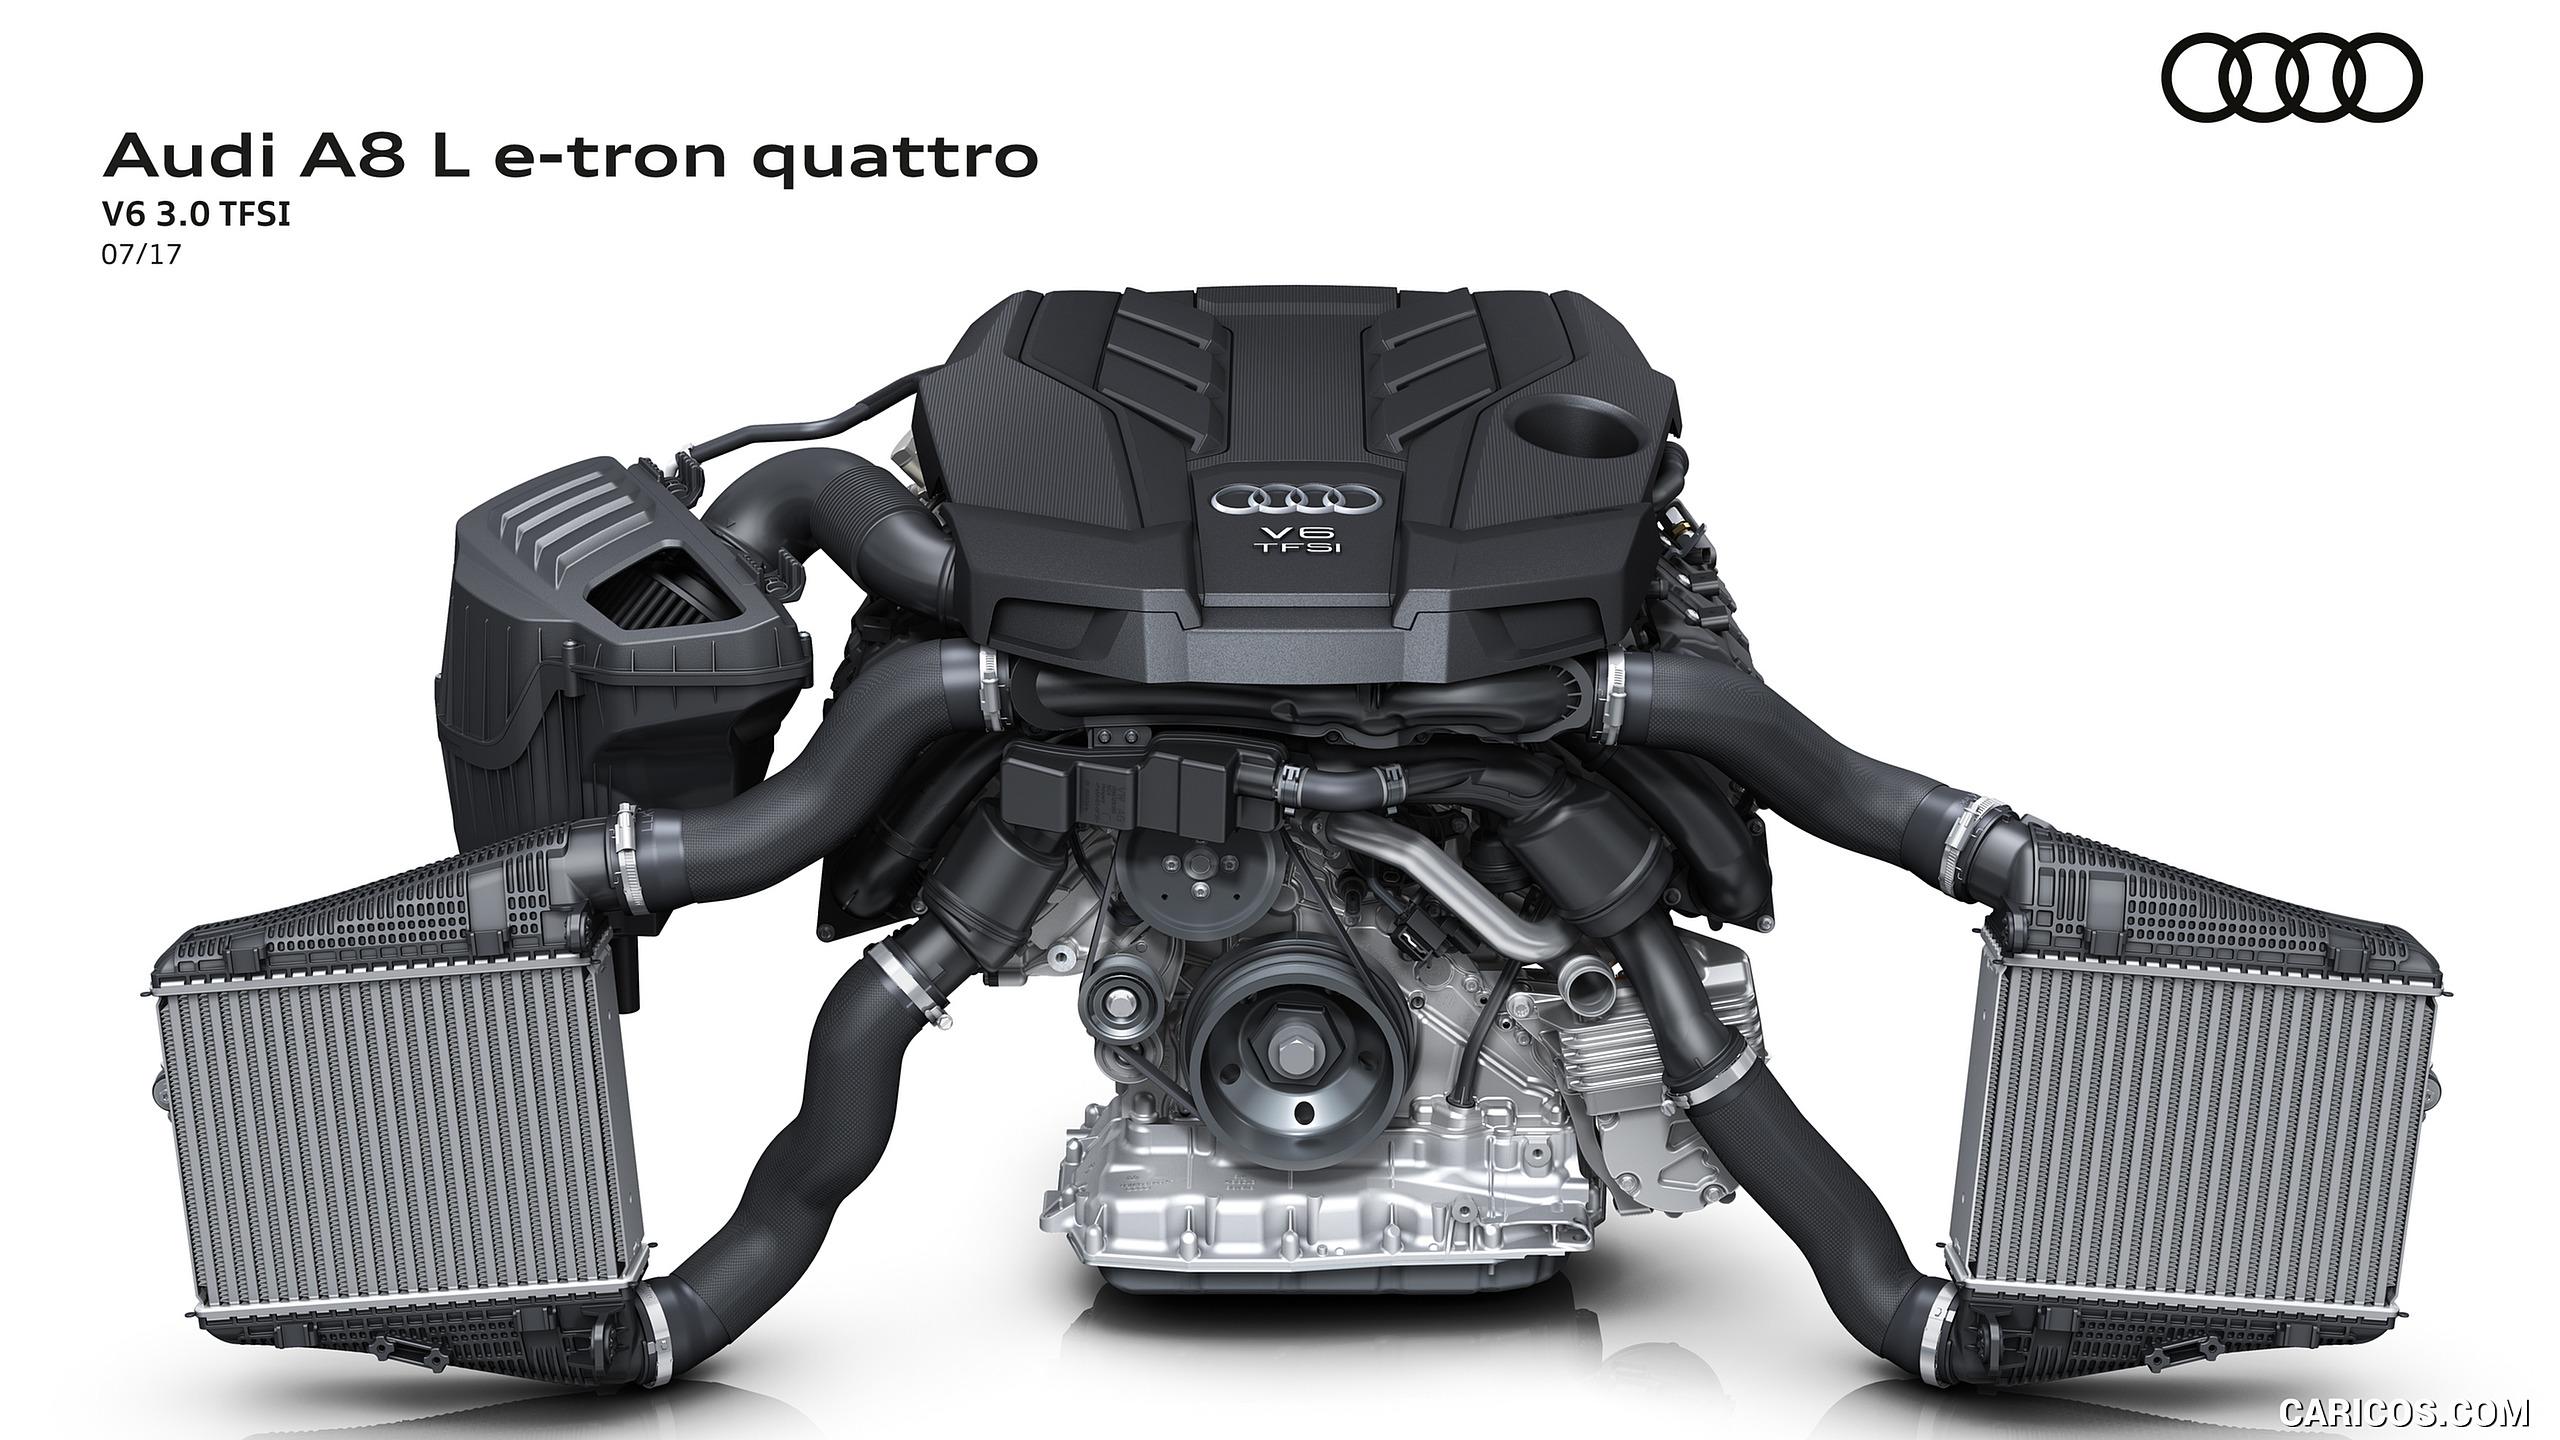 2018 Audi A8 L e tron   V6 30 TFSI Engine HD Wallpaper 54 2560x1440